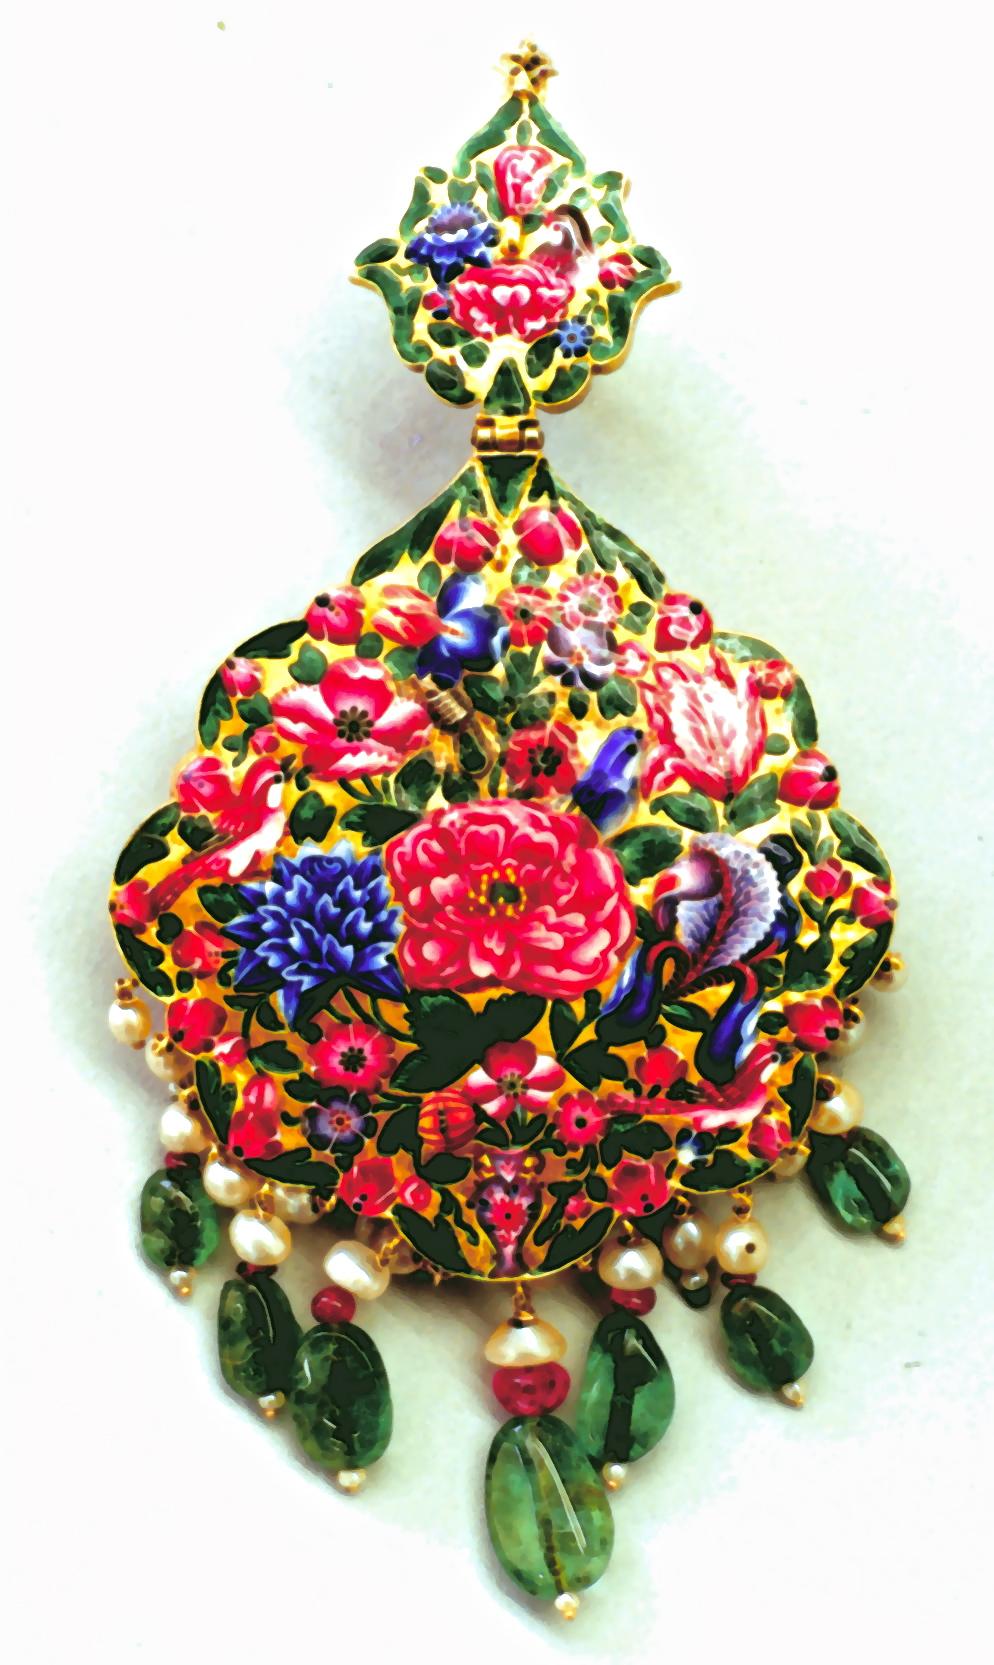 Persian Turban Orname copy. Jewelry Repair and Restoration.